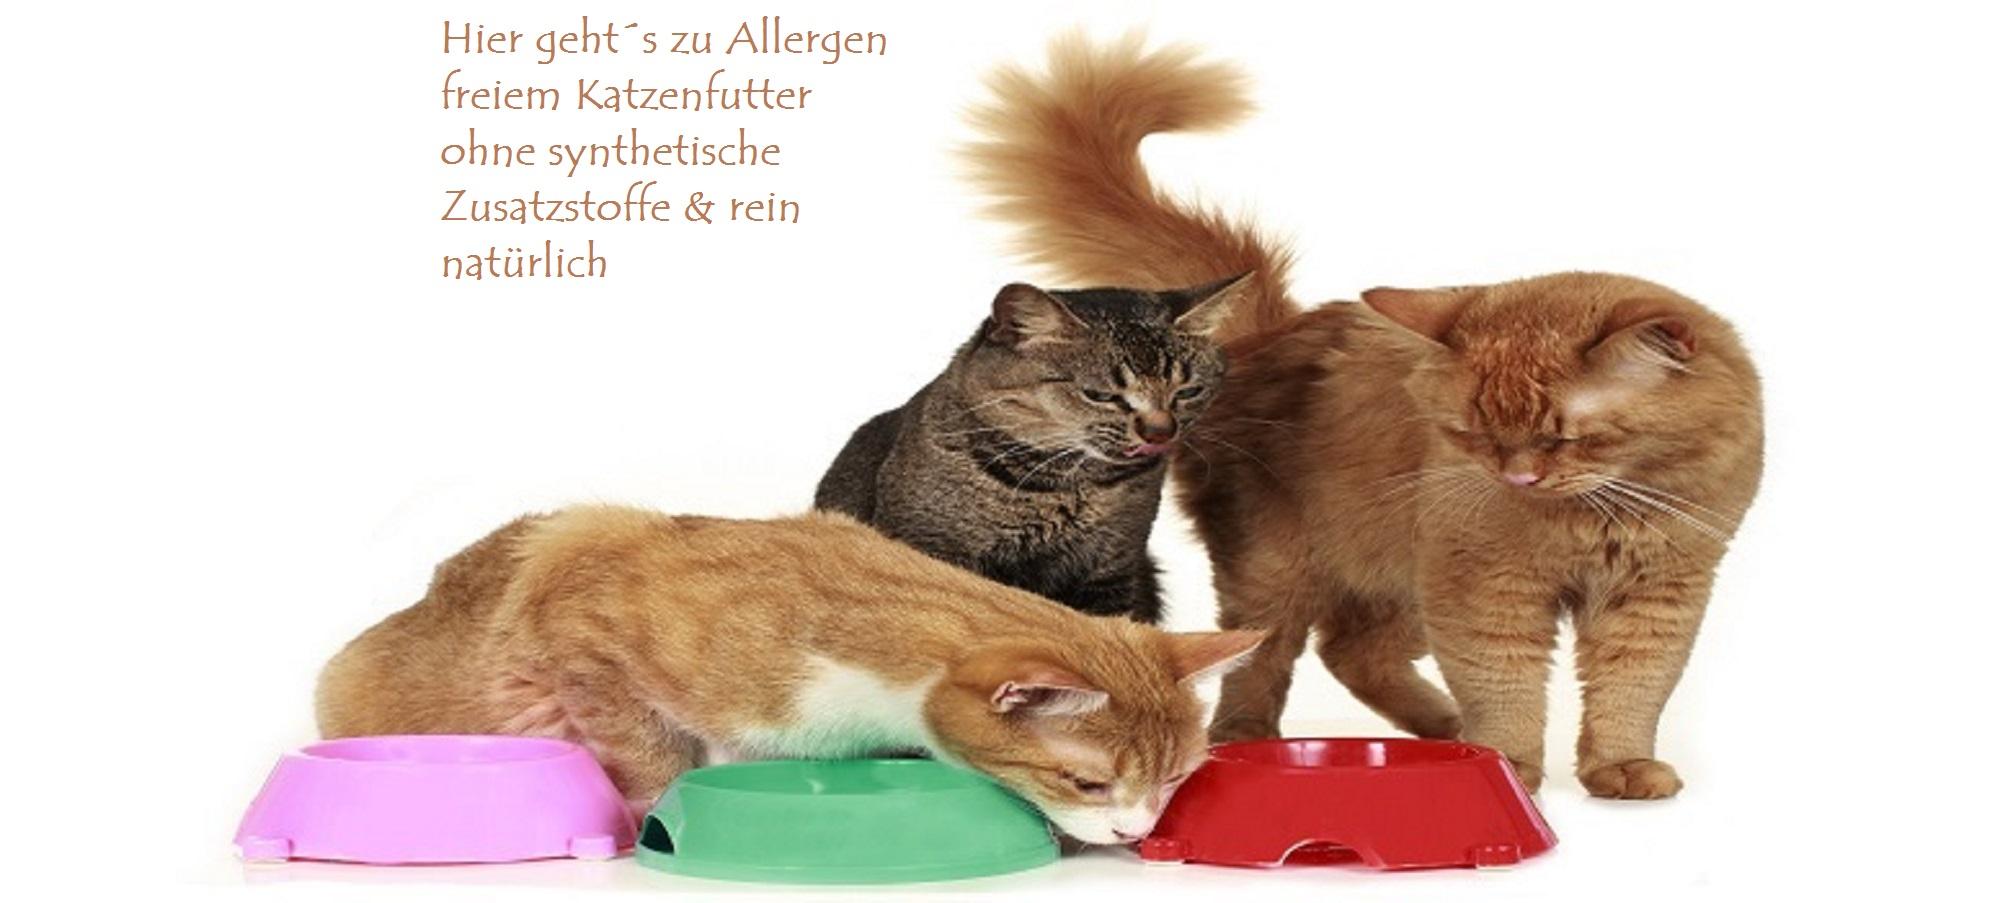 Futtermittelallergien bei Katzen